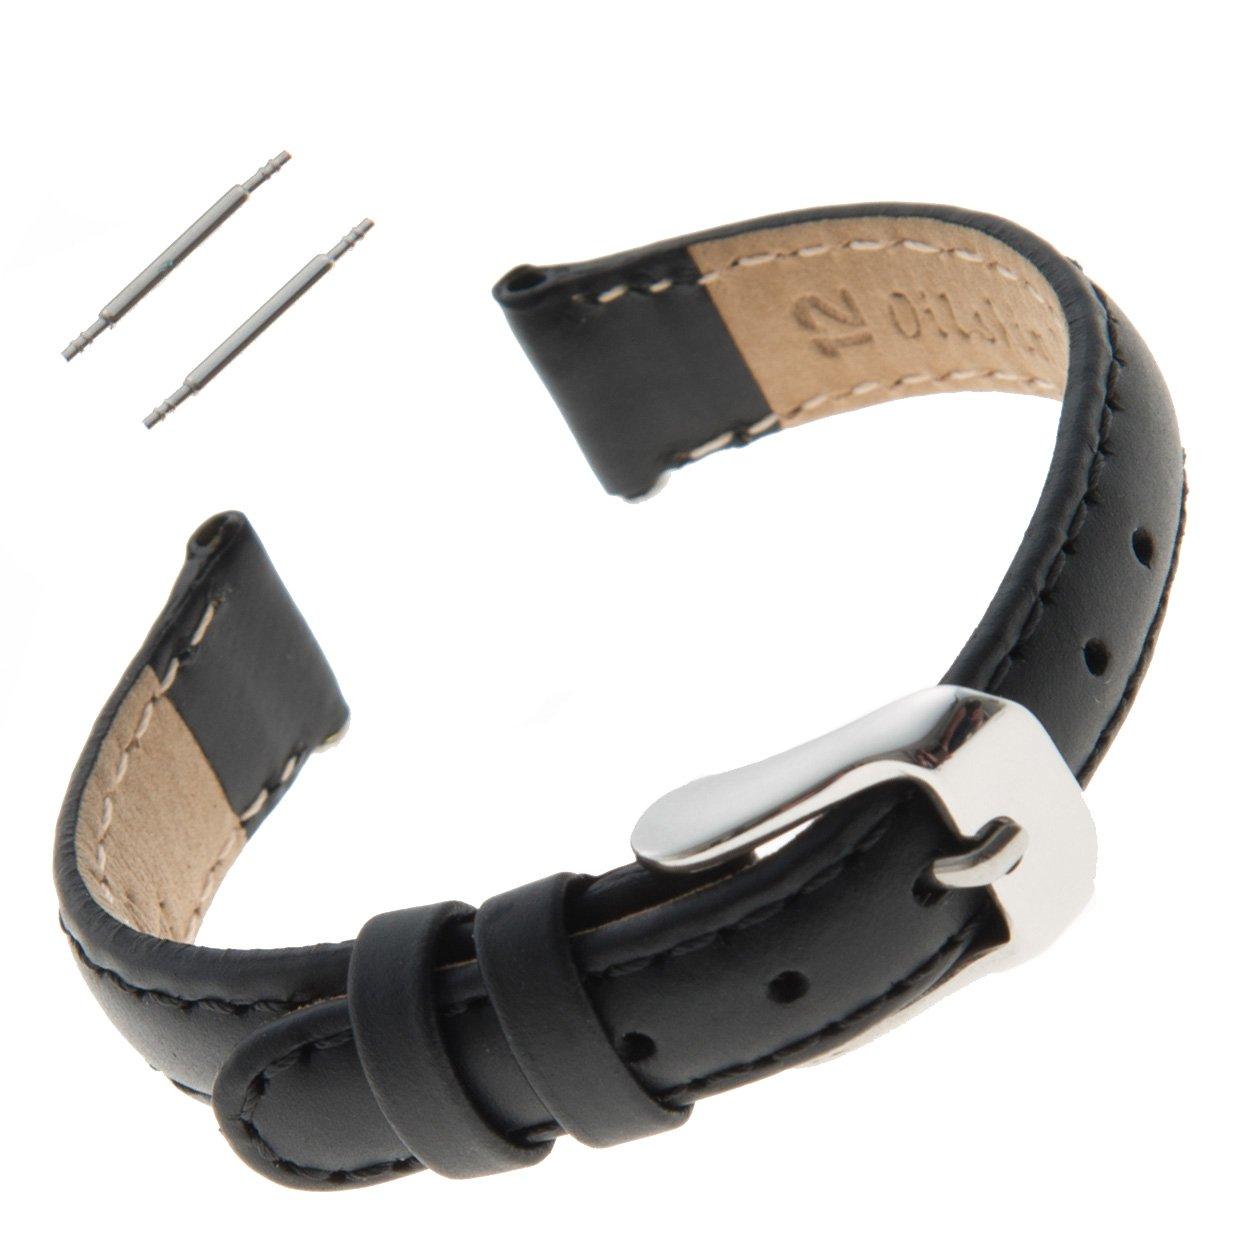 Gilden 12-14mm Water-Resistant Oilskin Black Leather Ladies Watch Strap MSW63-0112 (12 Millimeter end Width)